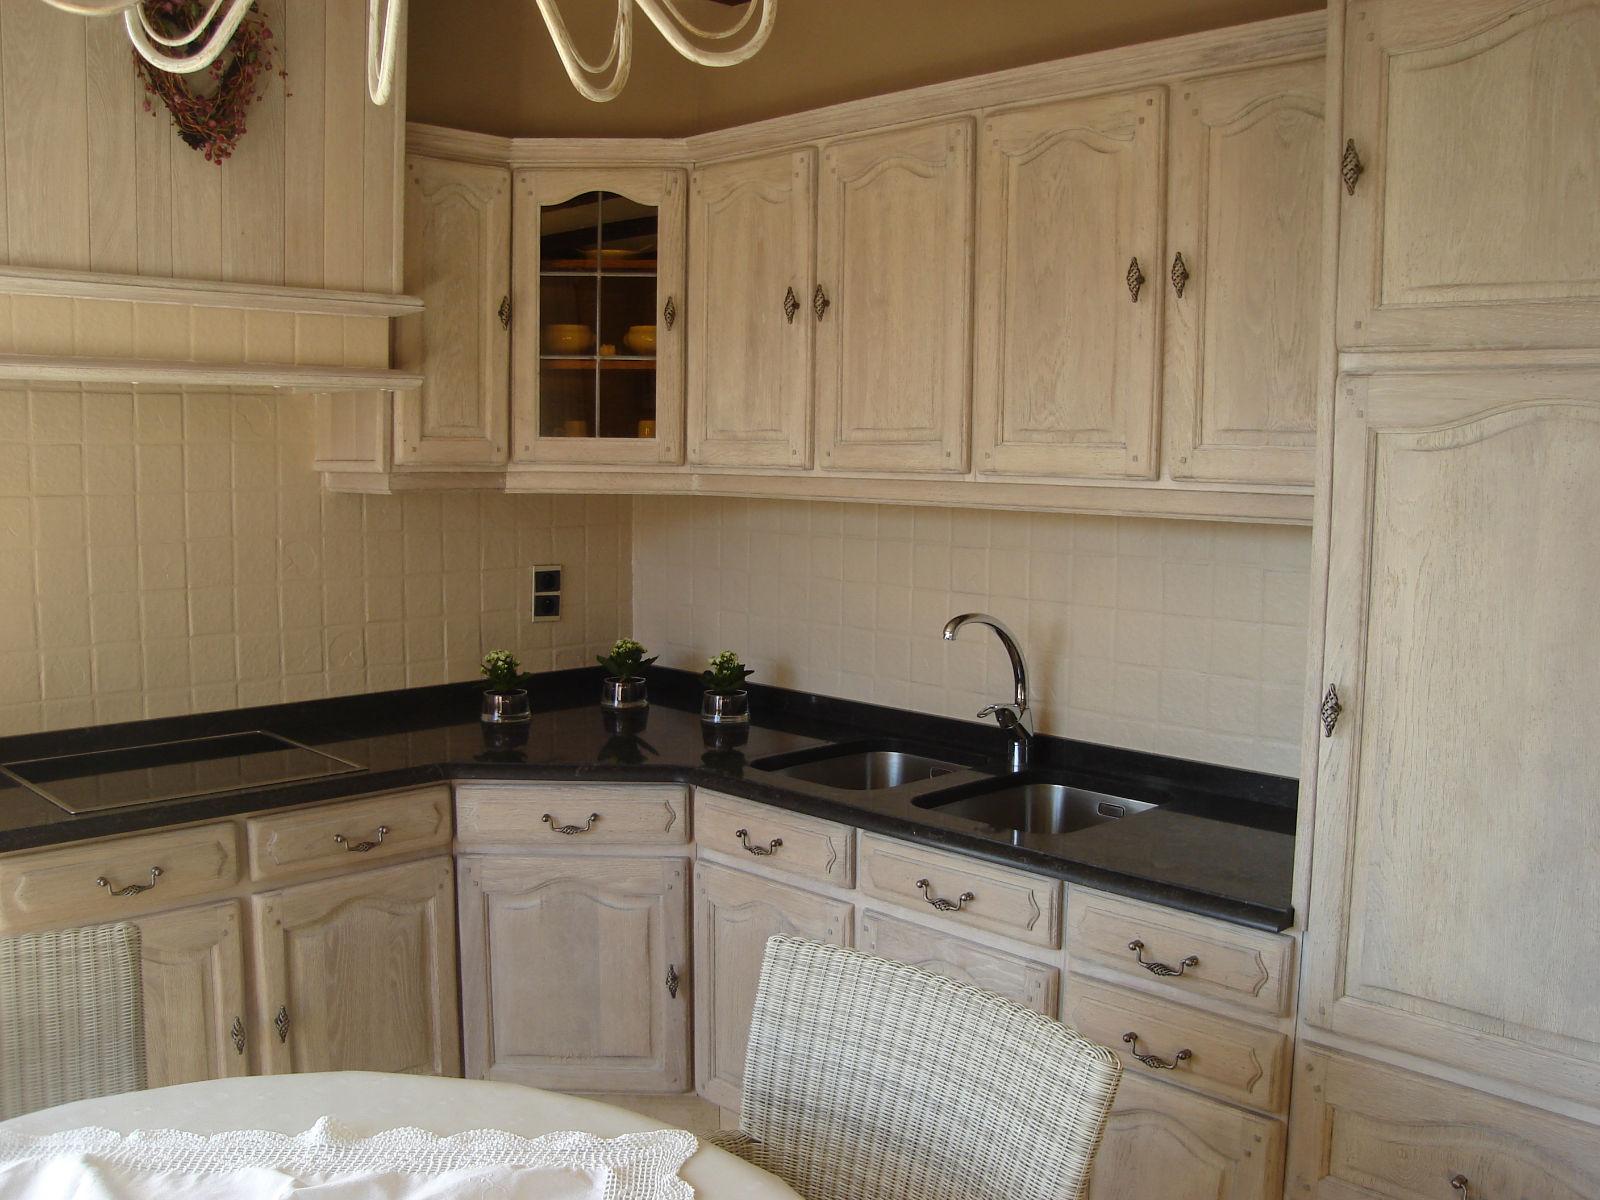 Keuken Keukenrenovatie : keukenrenovatie keukenrenovatie keukenrenovatie keukenrenovatie